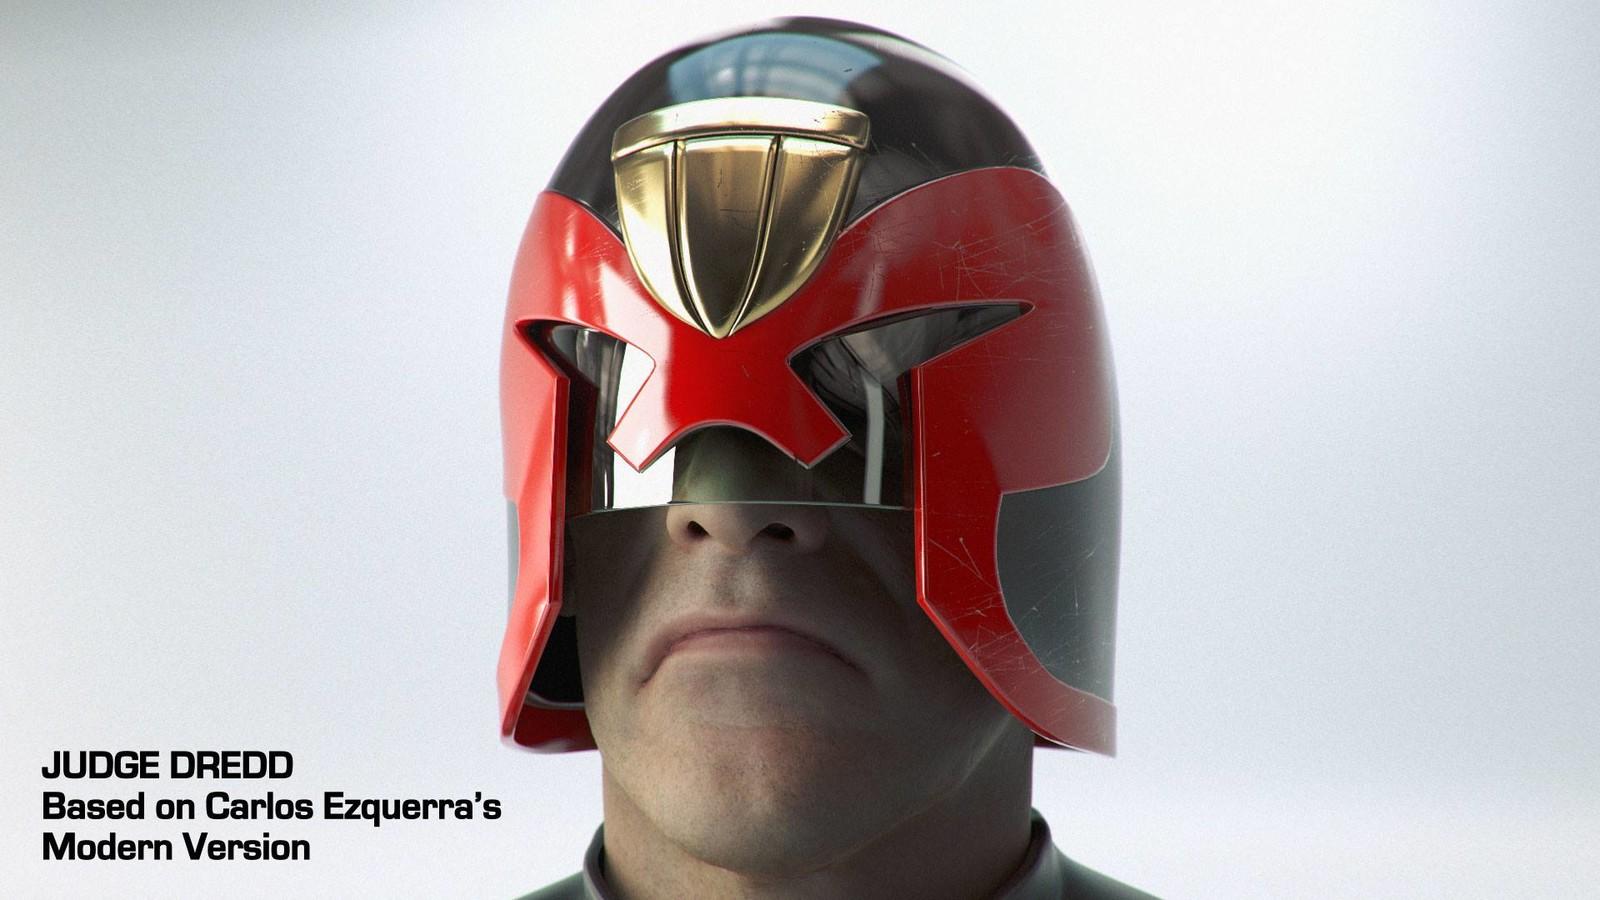 Modern Dredd helmet based on a design by Carlos Ezquerra (Head sculpt by Ten24)